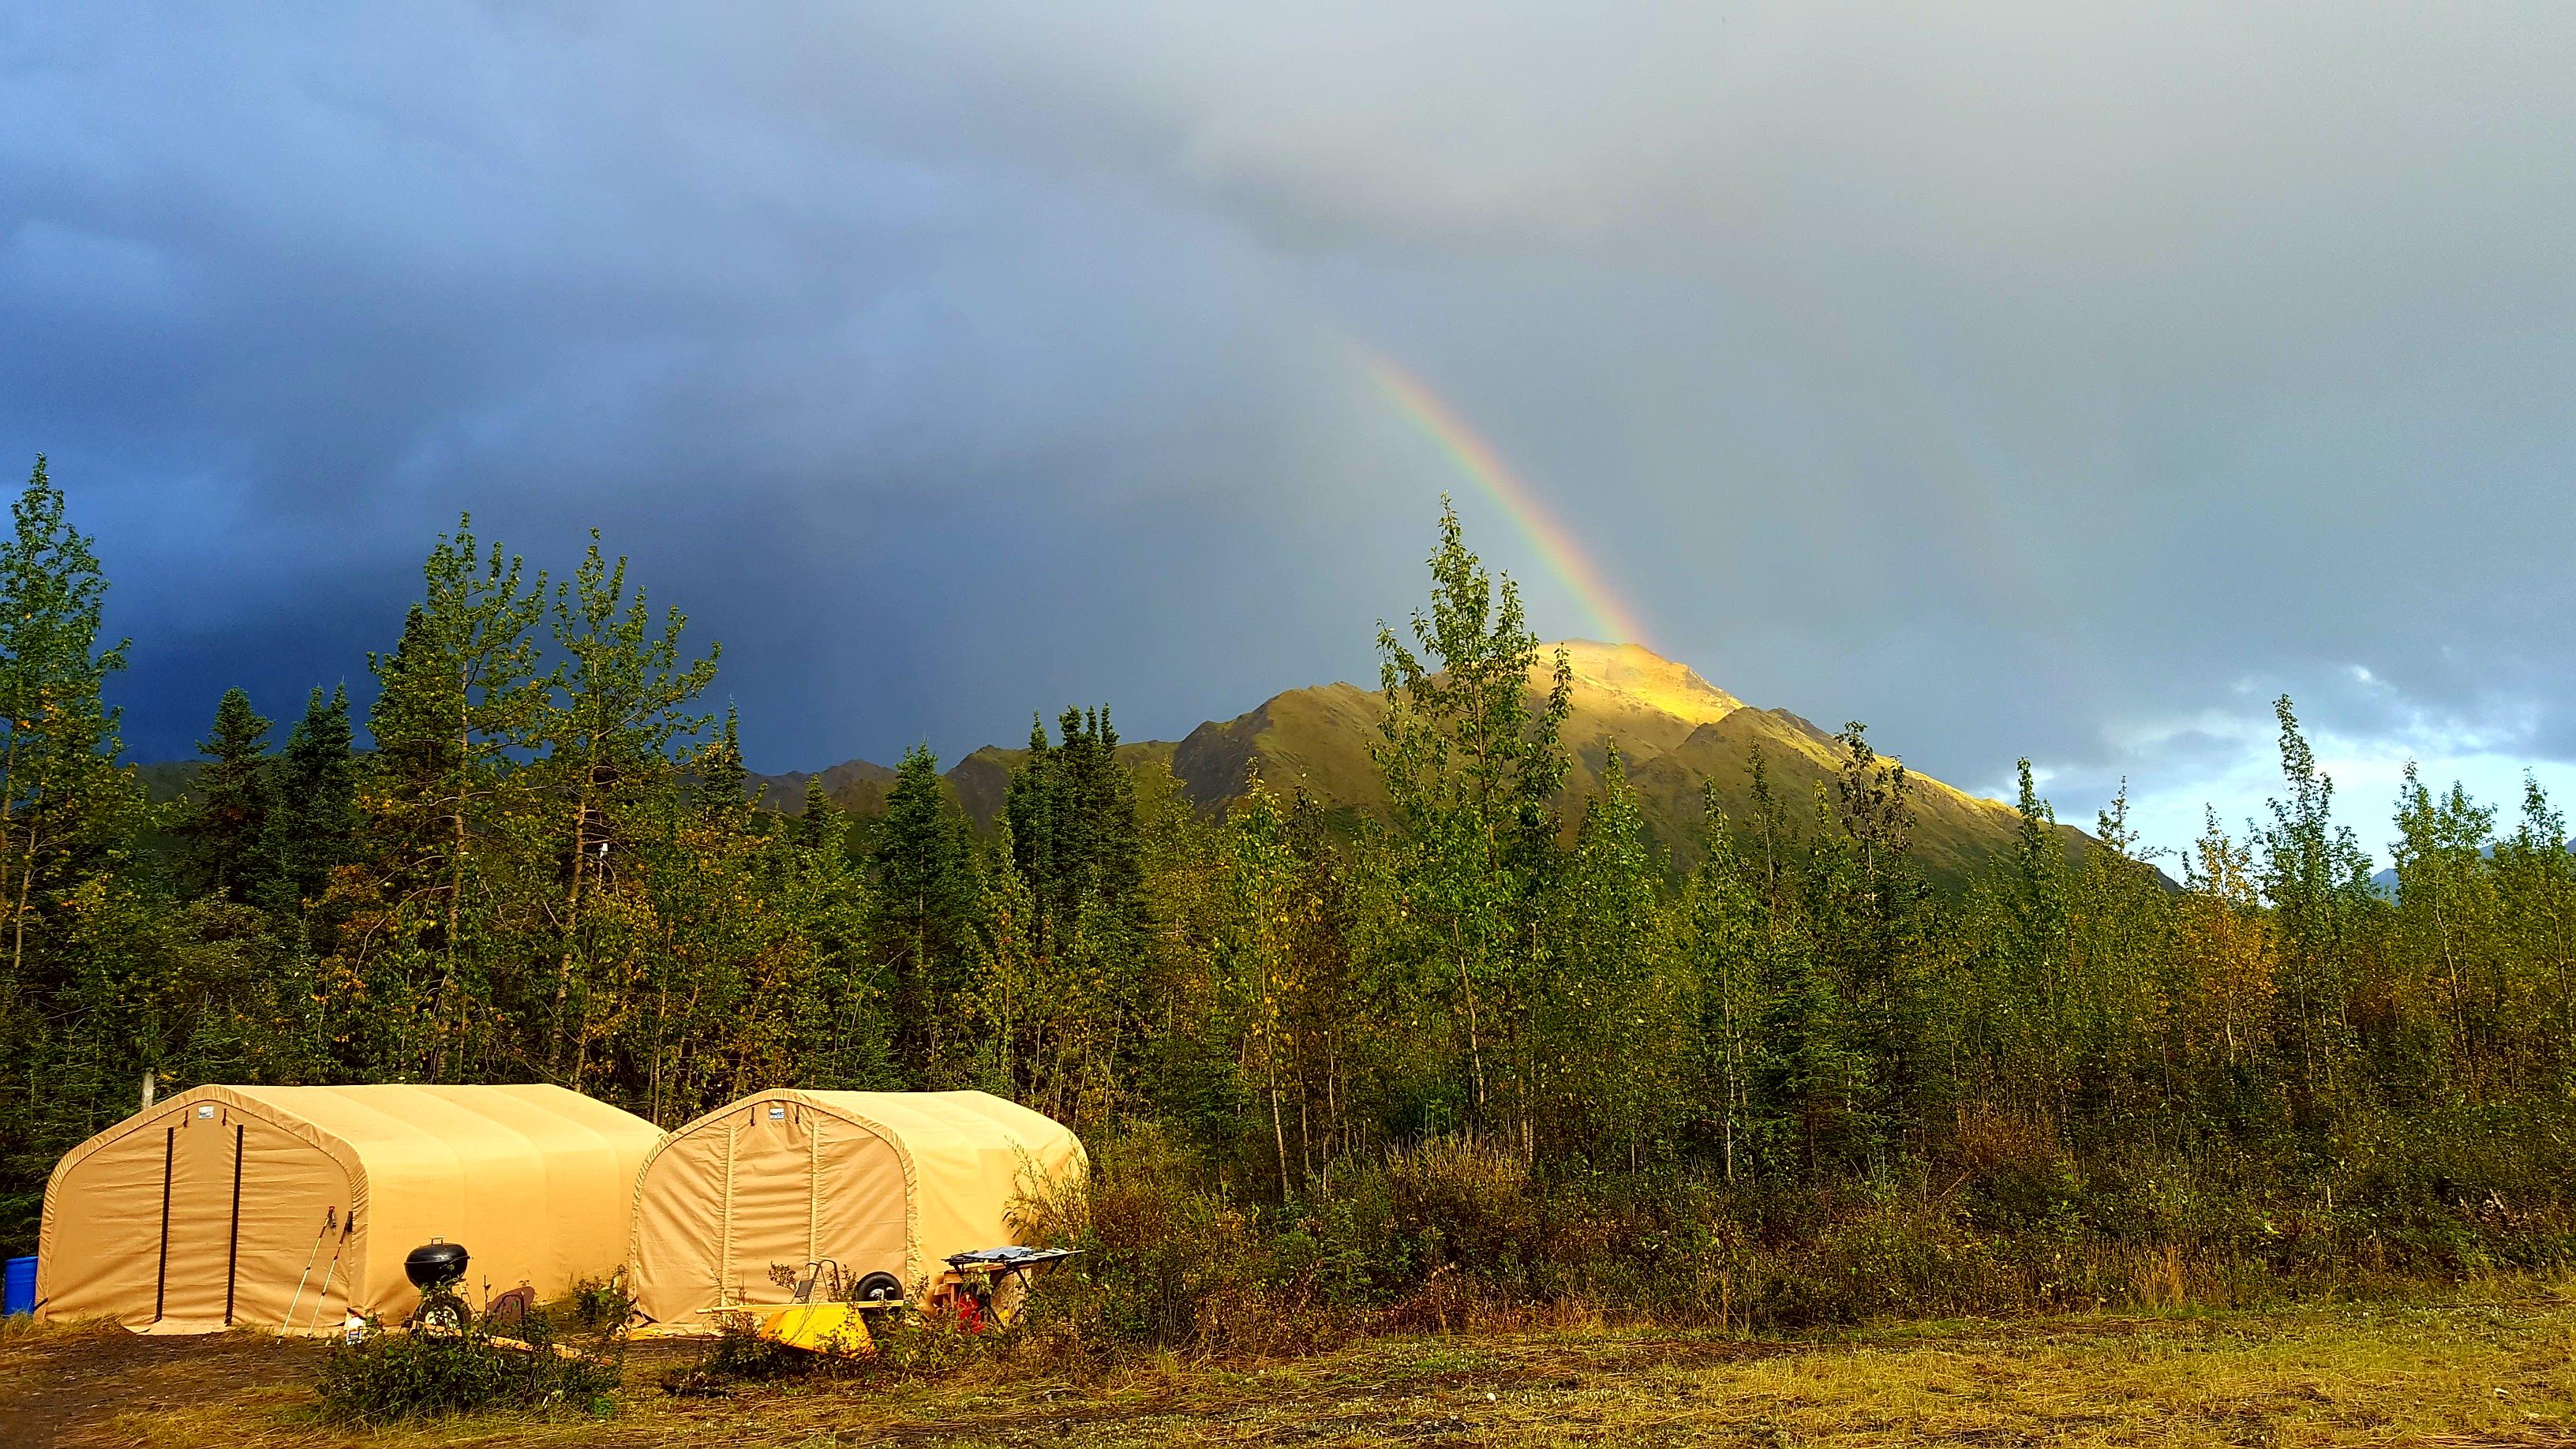 Snag Creek base camp